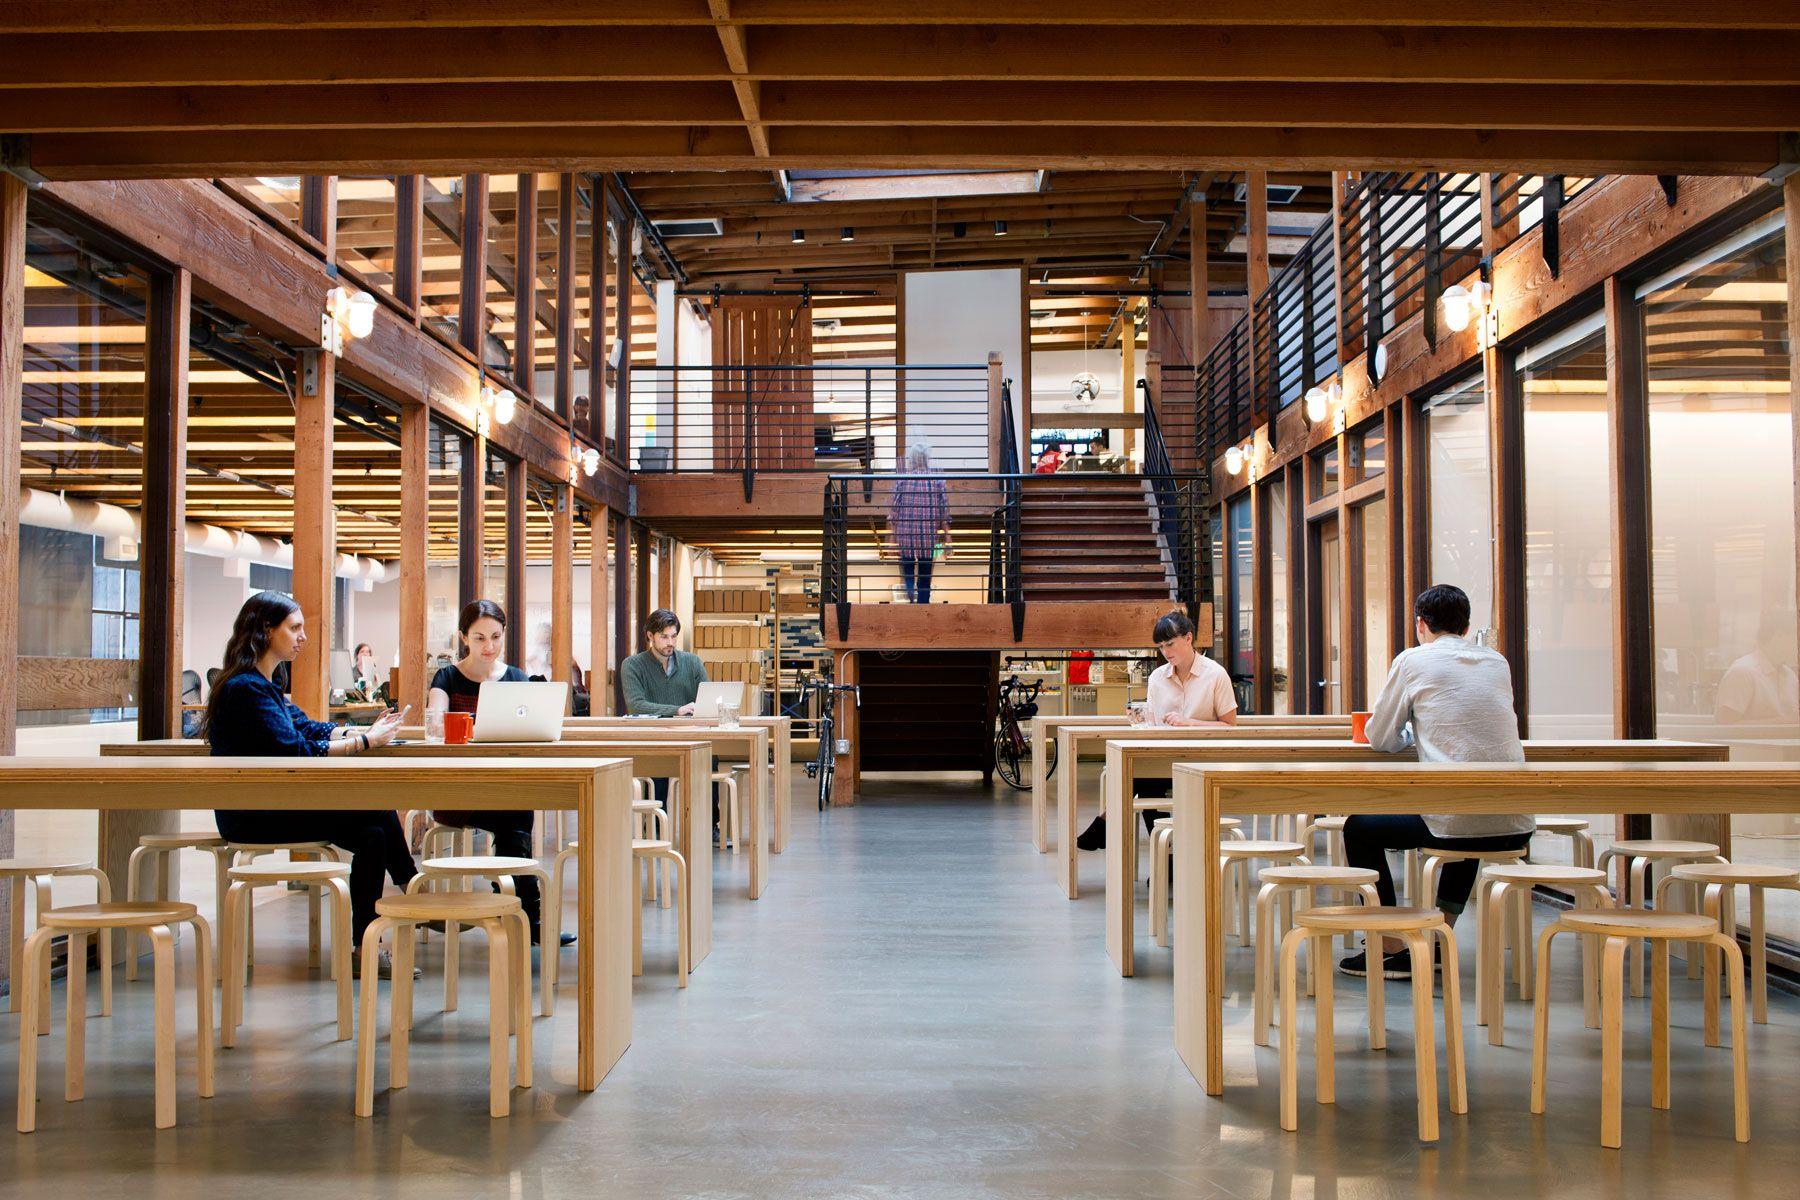 Take a tour of postmates beautiful san francisco office - Office interior design san francisco ...